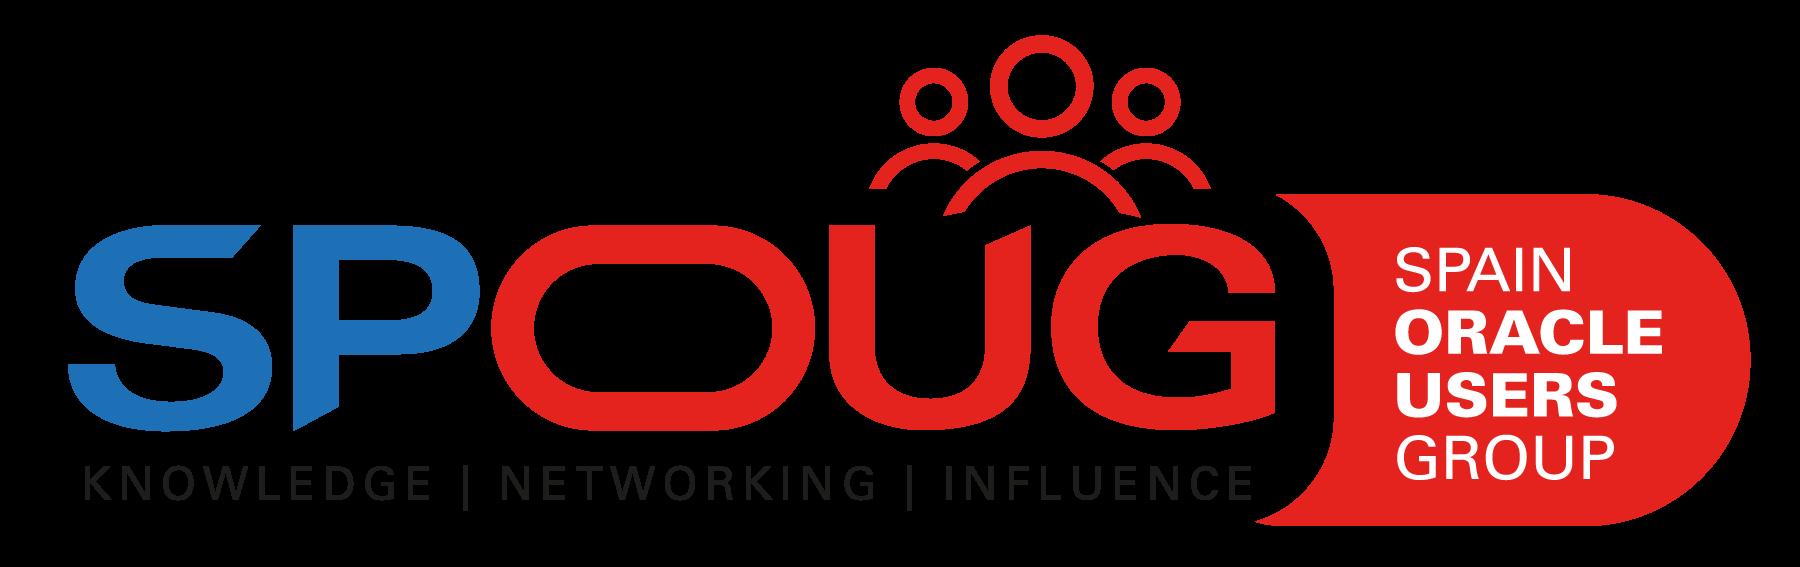 SPOUG - Spain Oracle Users Group